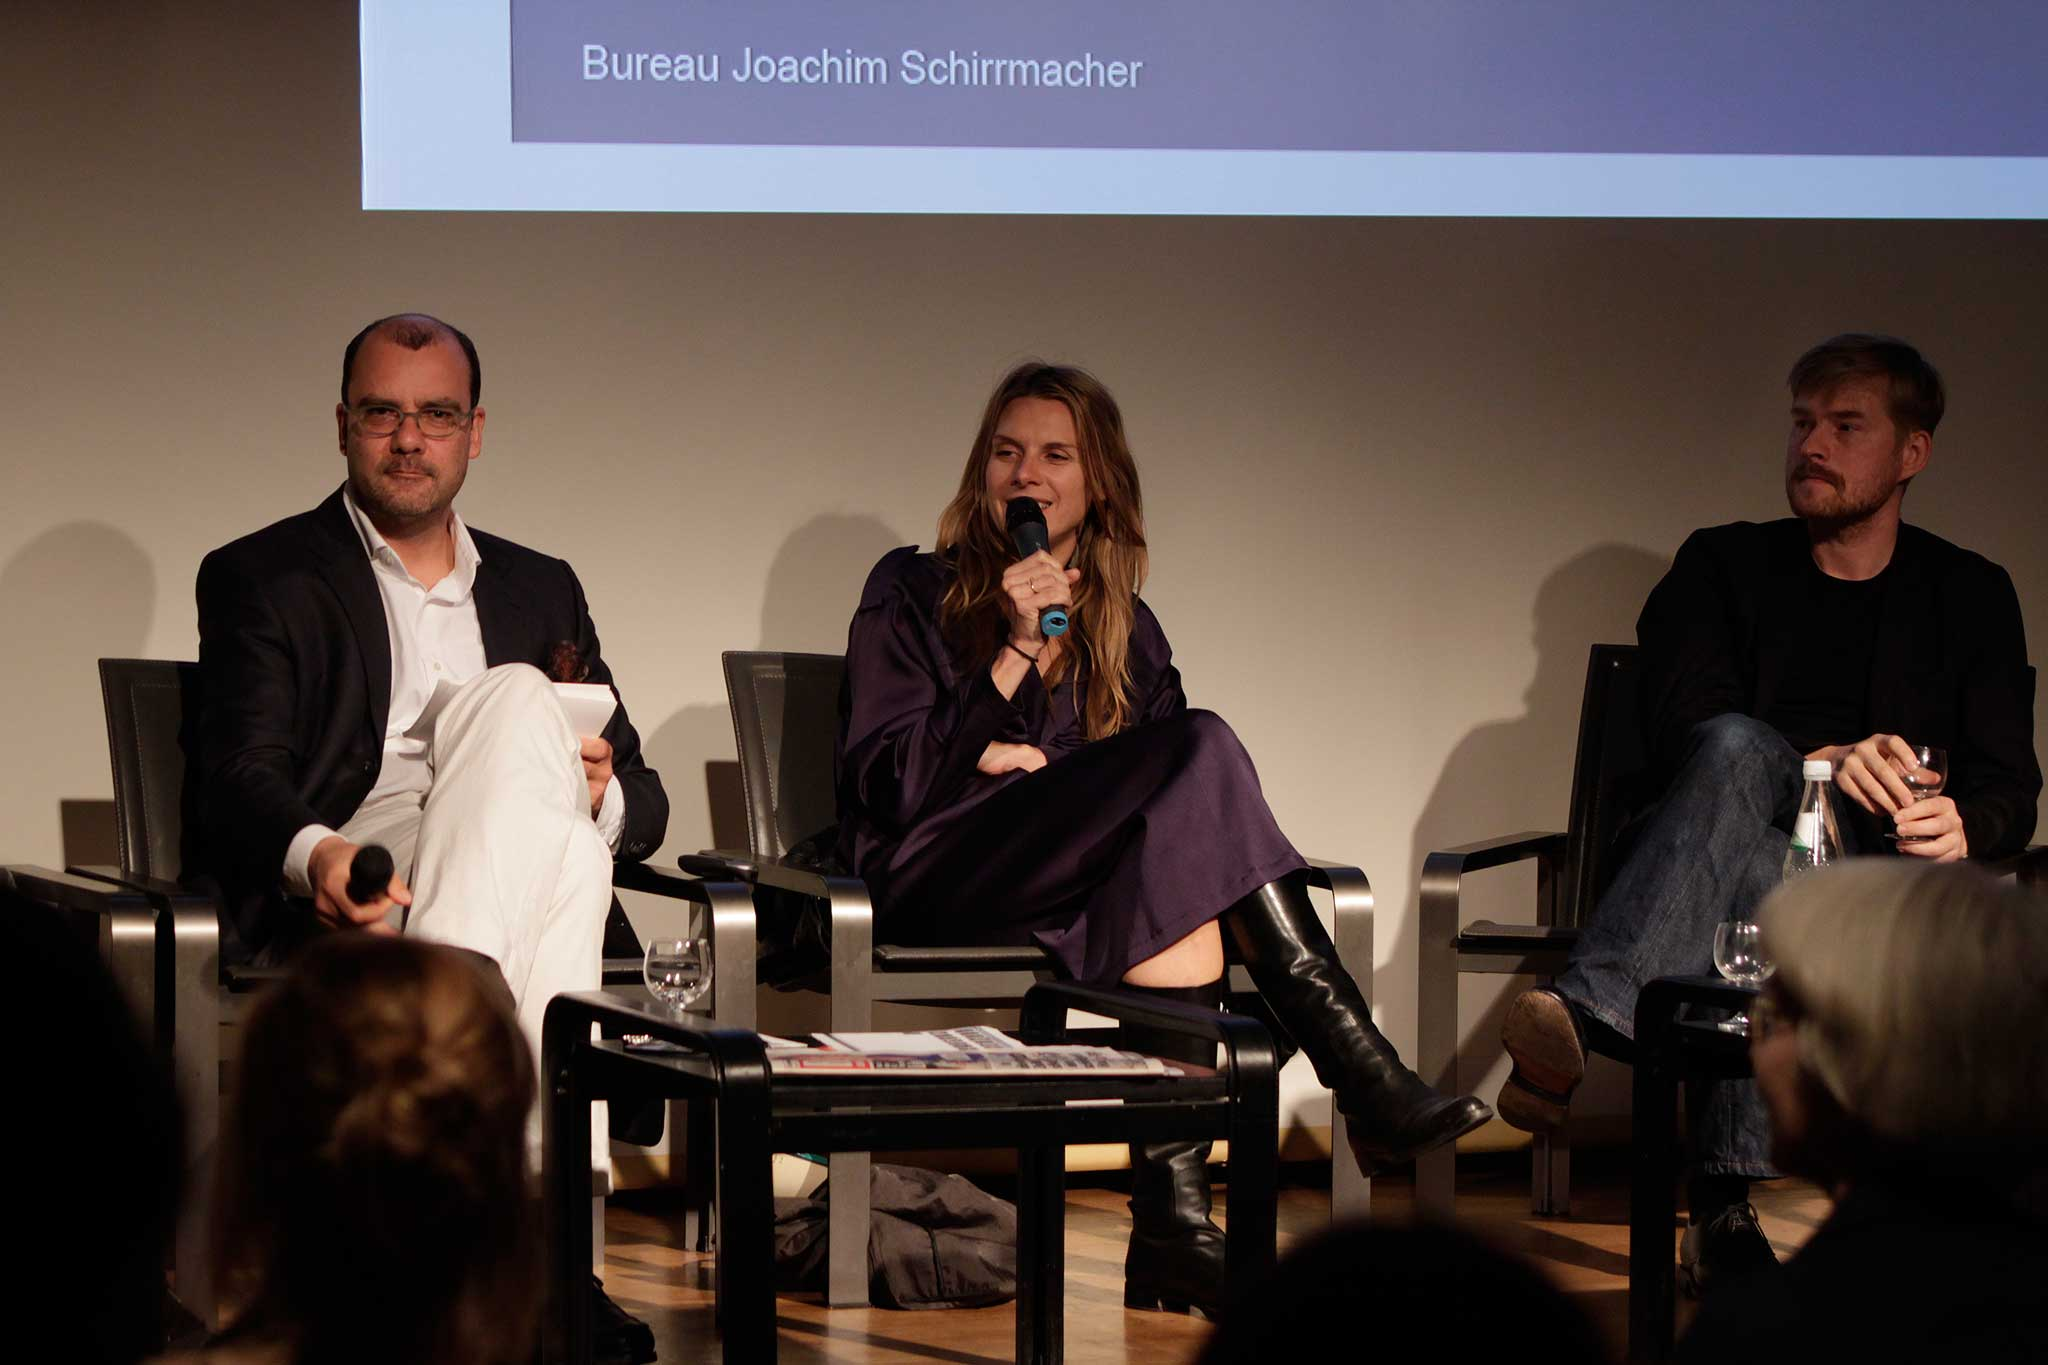 Joachim Schirrmacher, Julia Freitag, Greogr Hohenberg